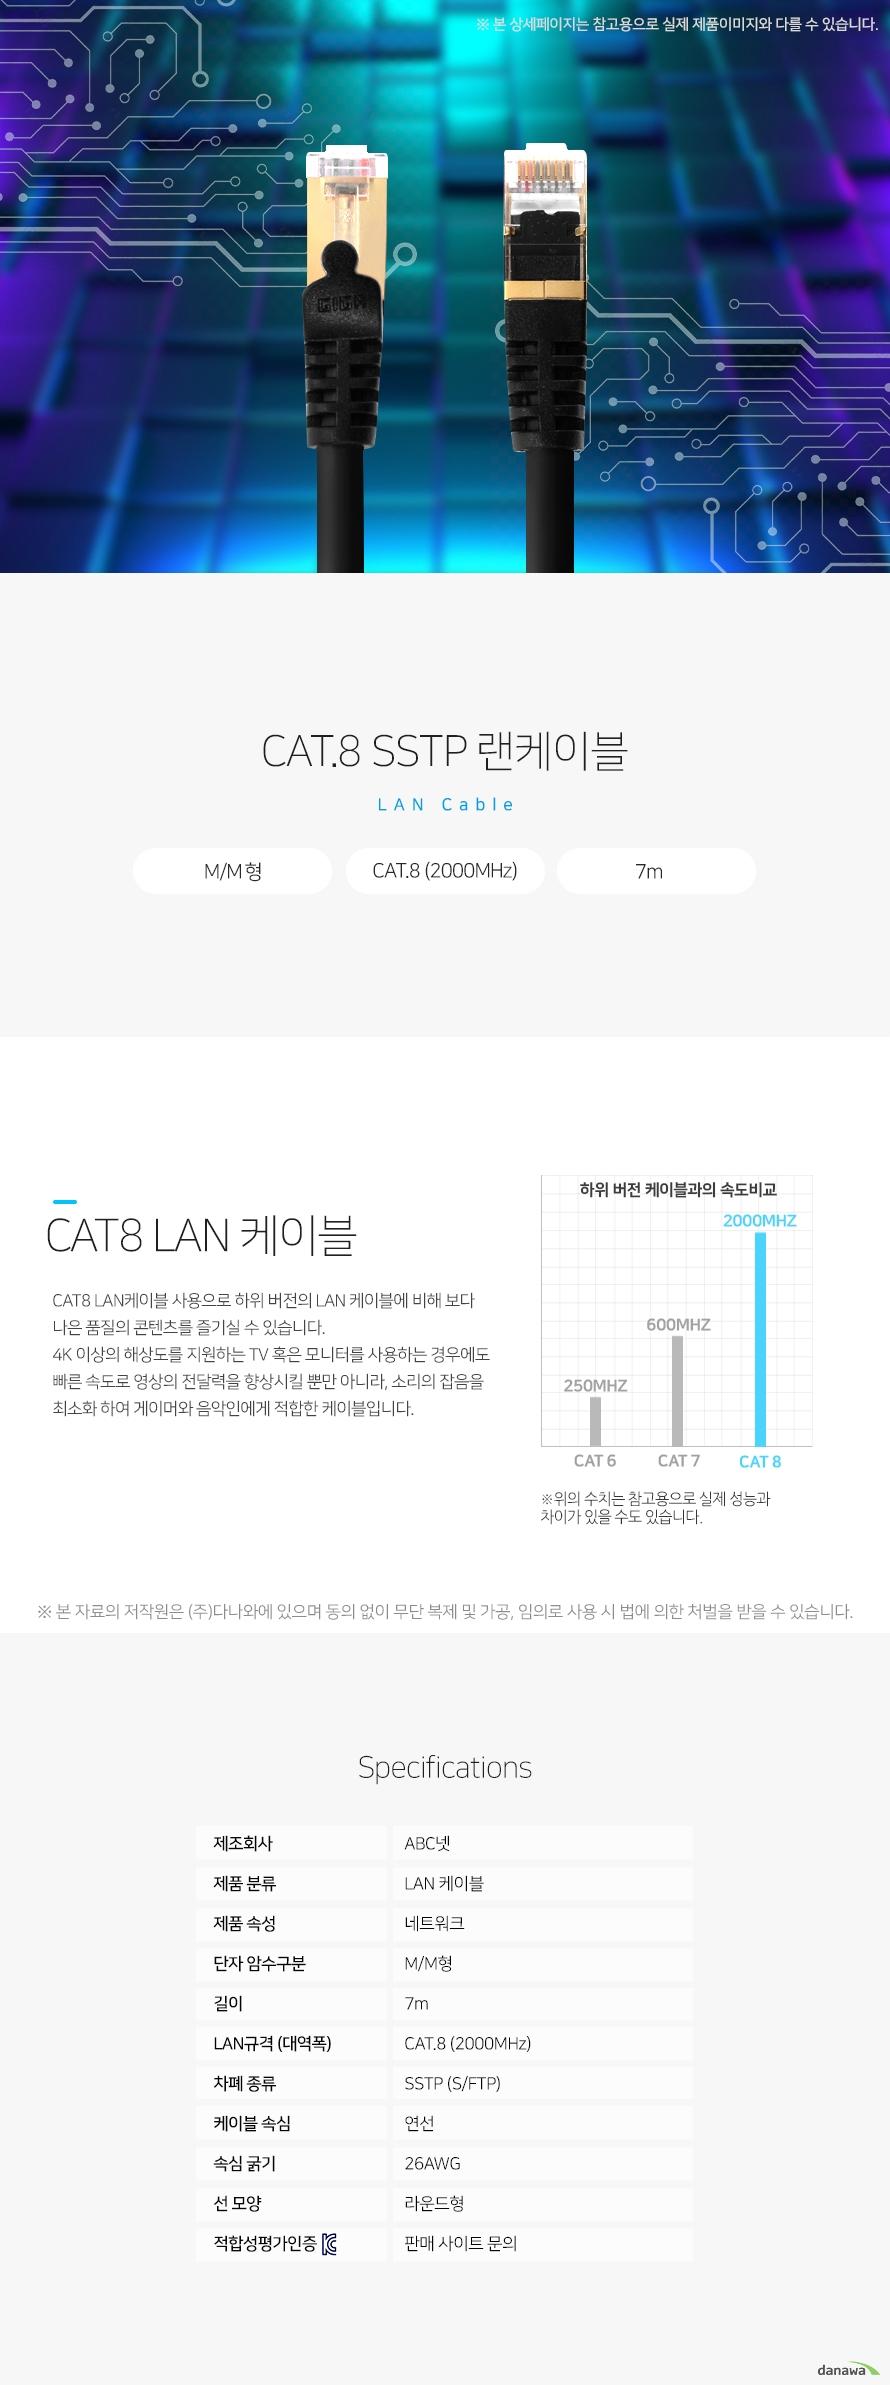 ABC넷 CAT.8 SSTP 랜케이블 (7m) 상세 스펙 LAN 케이블 / 네트워크 / M/M형 / CAT.8 (2000MHz) / SSTP (S/FTP) / 연선 / 26AWG / 라운드형 / RJ45 / RJ45